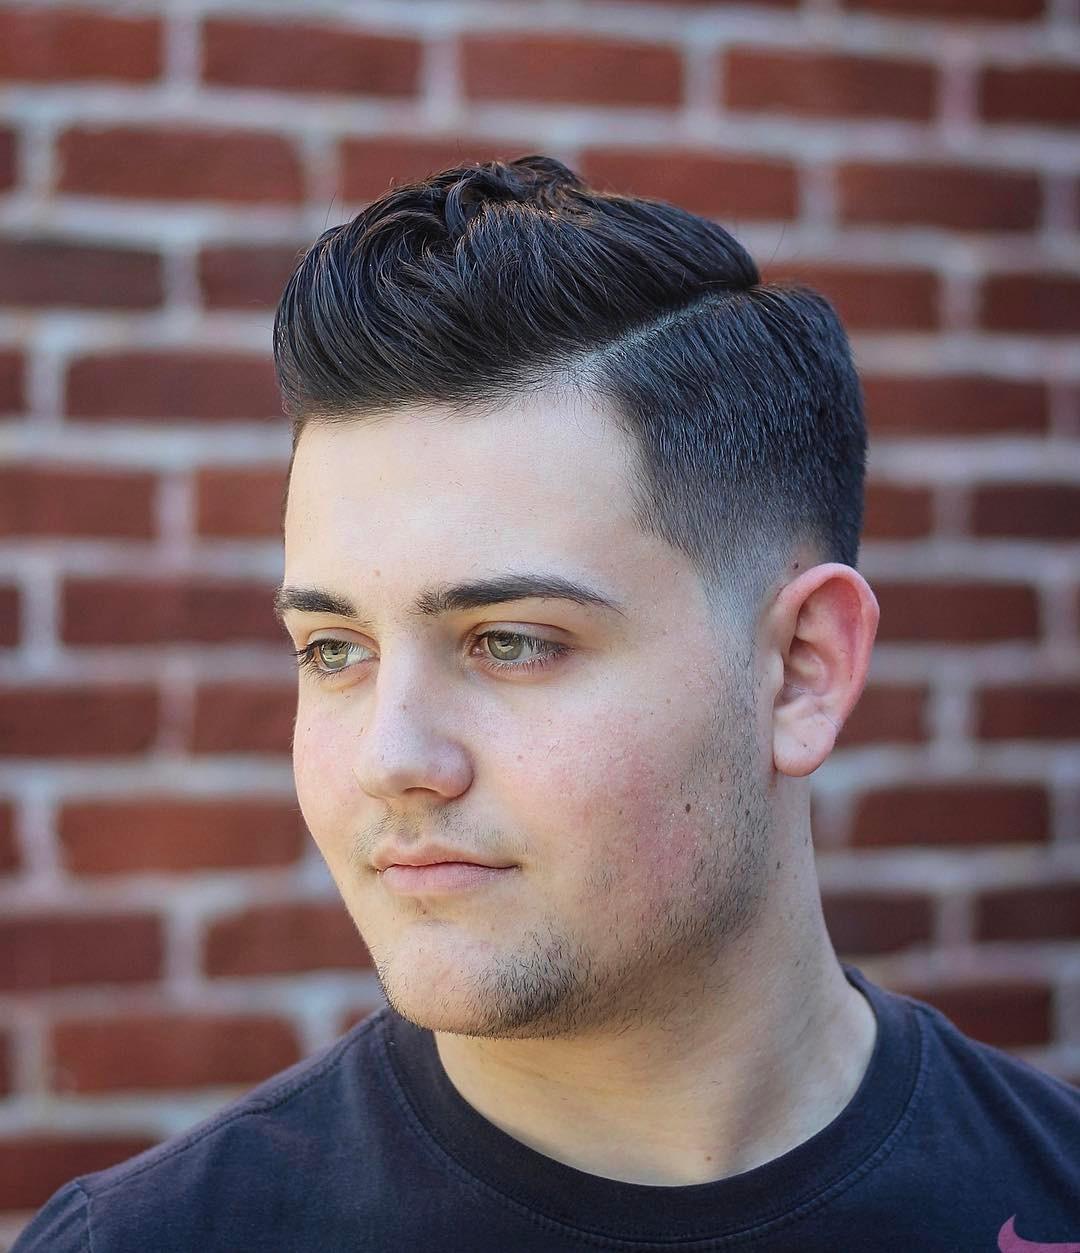 1518577271 barbermikethomas wavy comb over haircut 2018062014360777 large